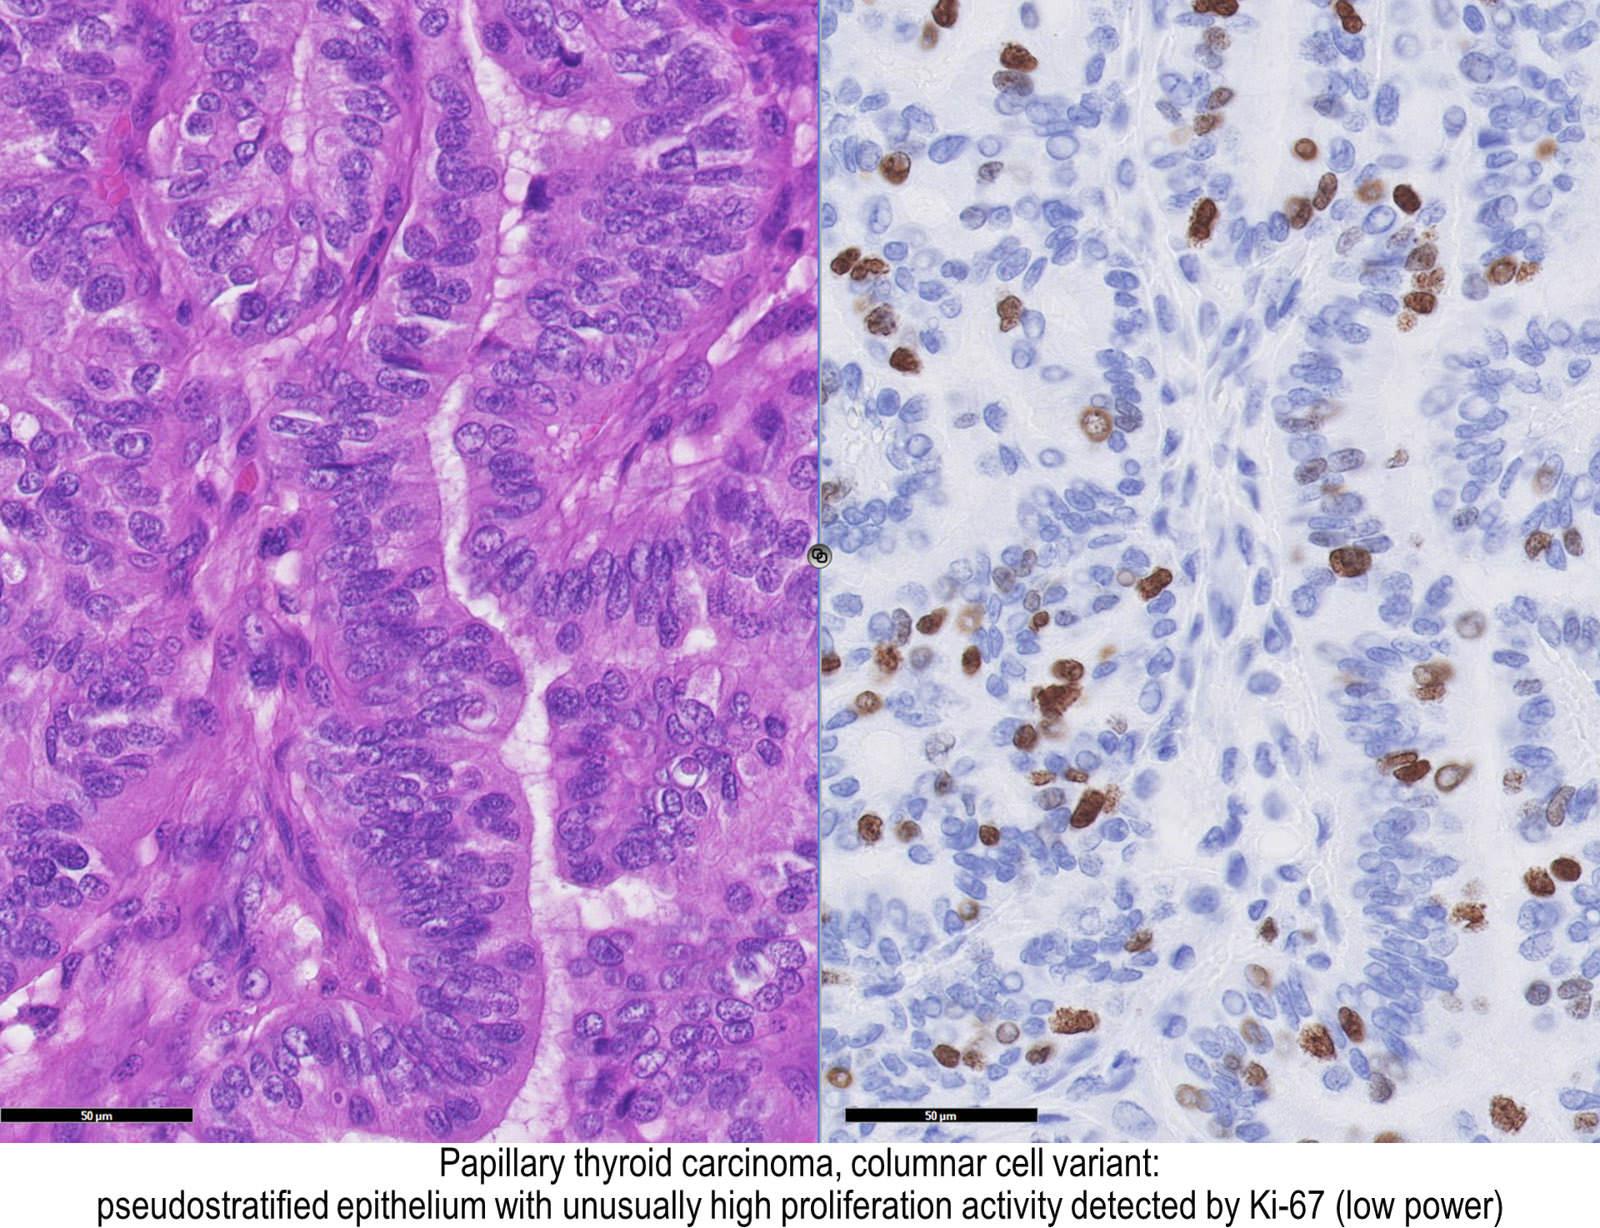 papillary thyroid carcinoma variants pathology outlines